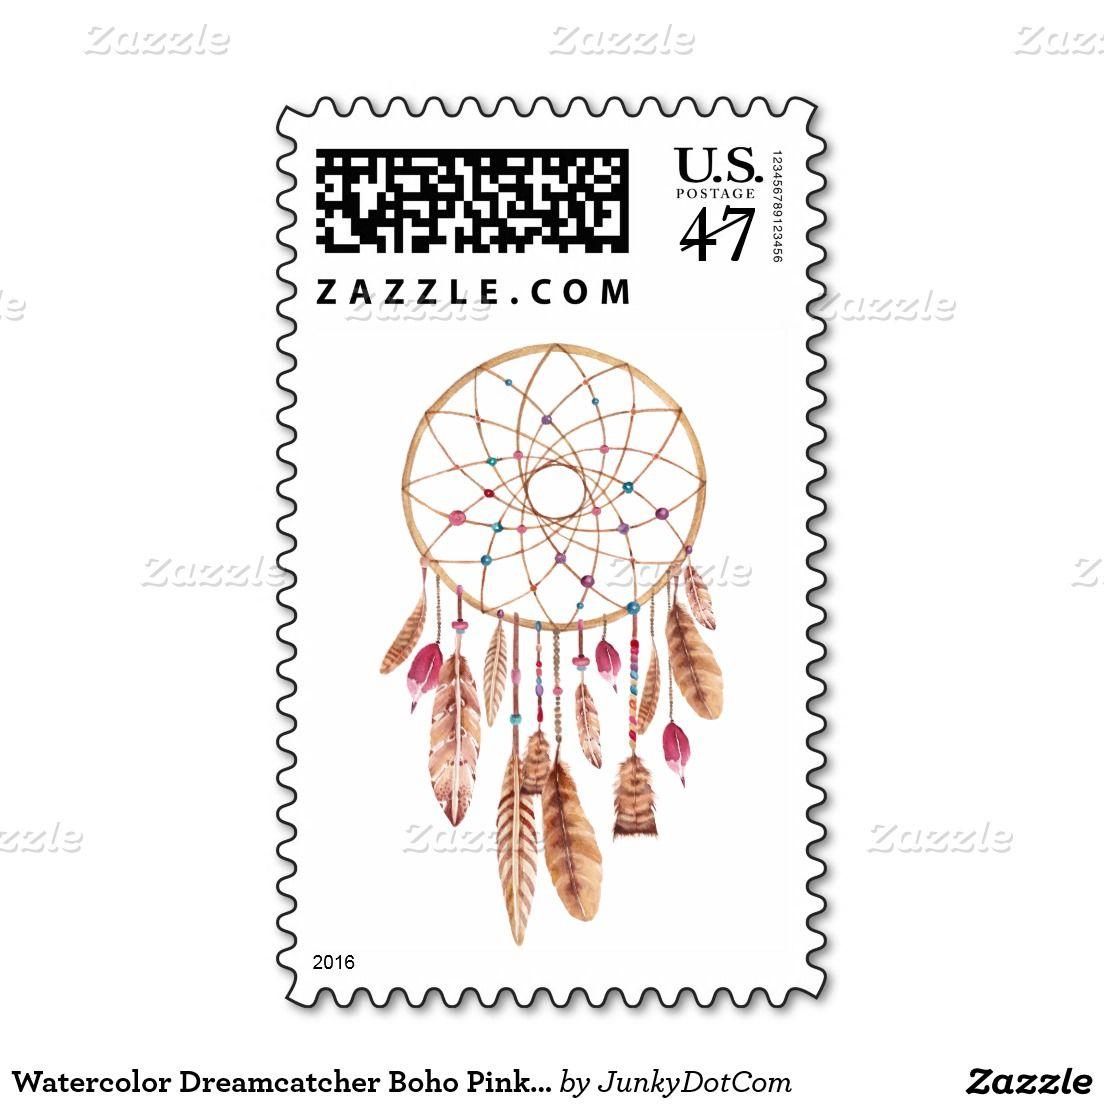 Watercolor Dreamcatcher Boho Pink Khaki Stamp @zazzle #junkydotcom 5x